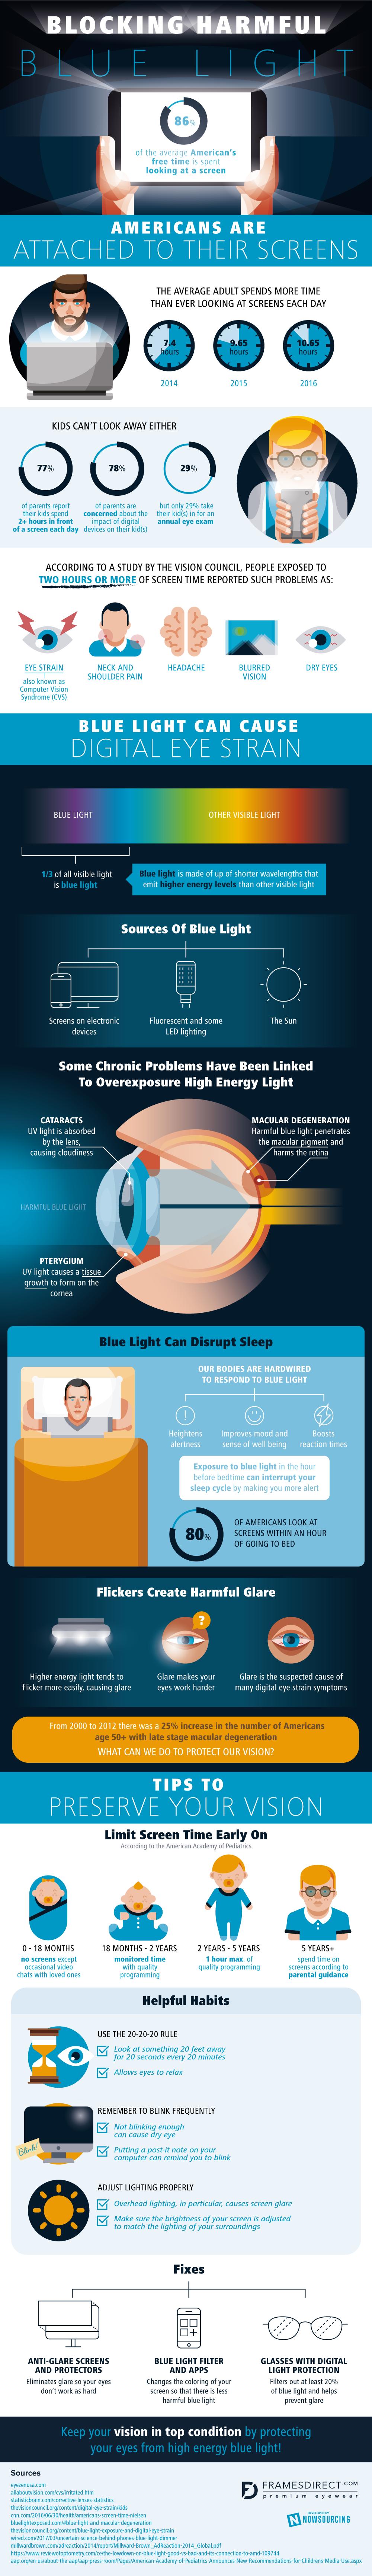 Blocking Harmful Blue Light